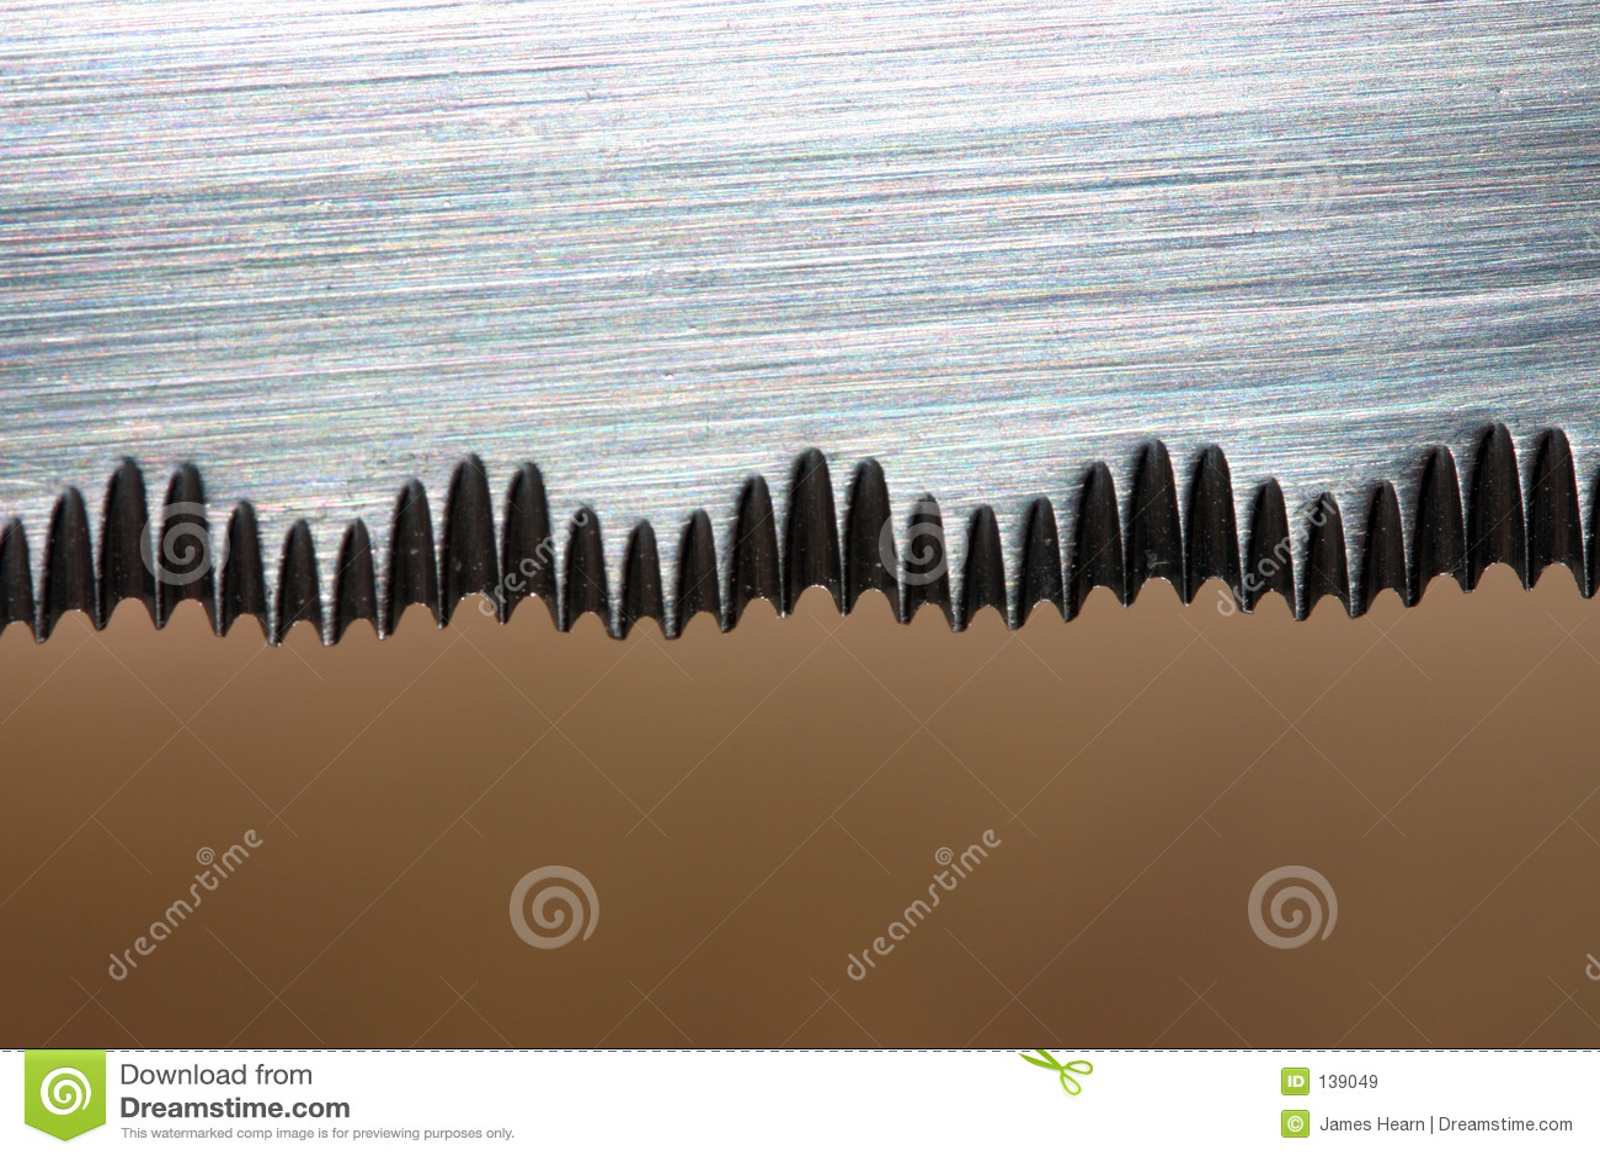 Ostrze noża serrated